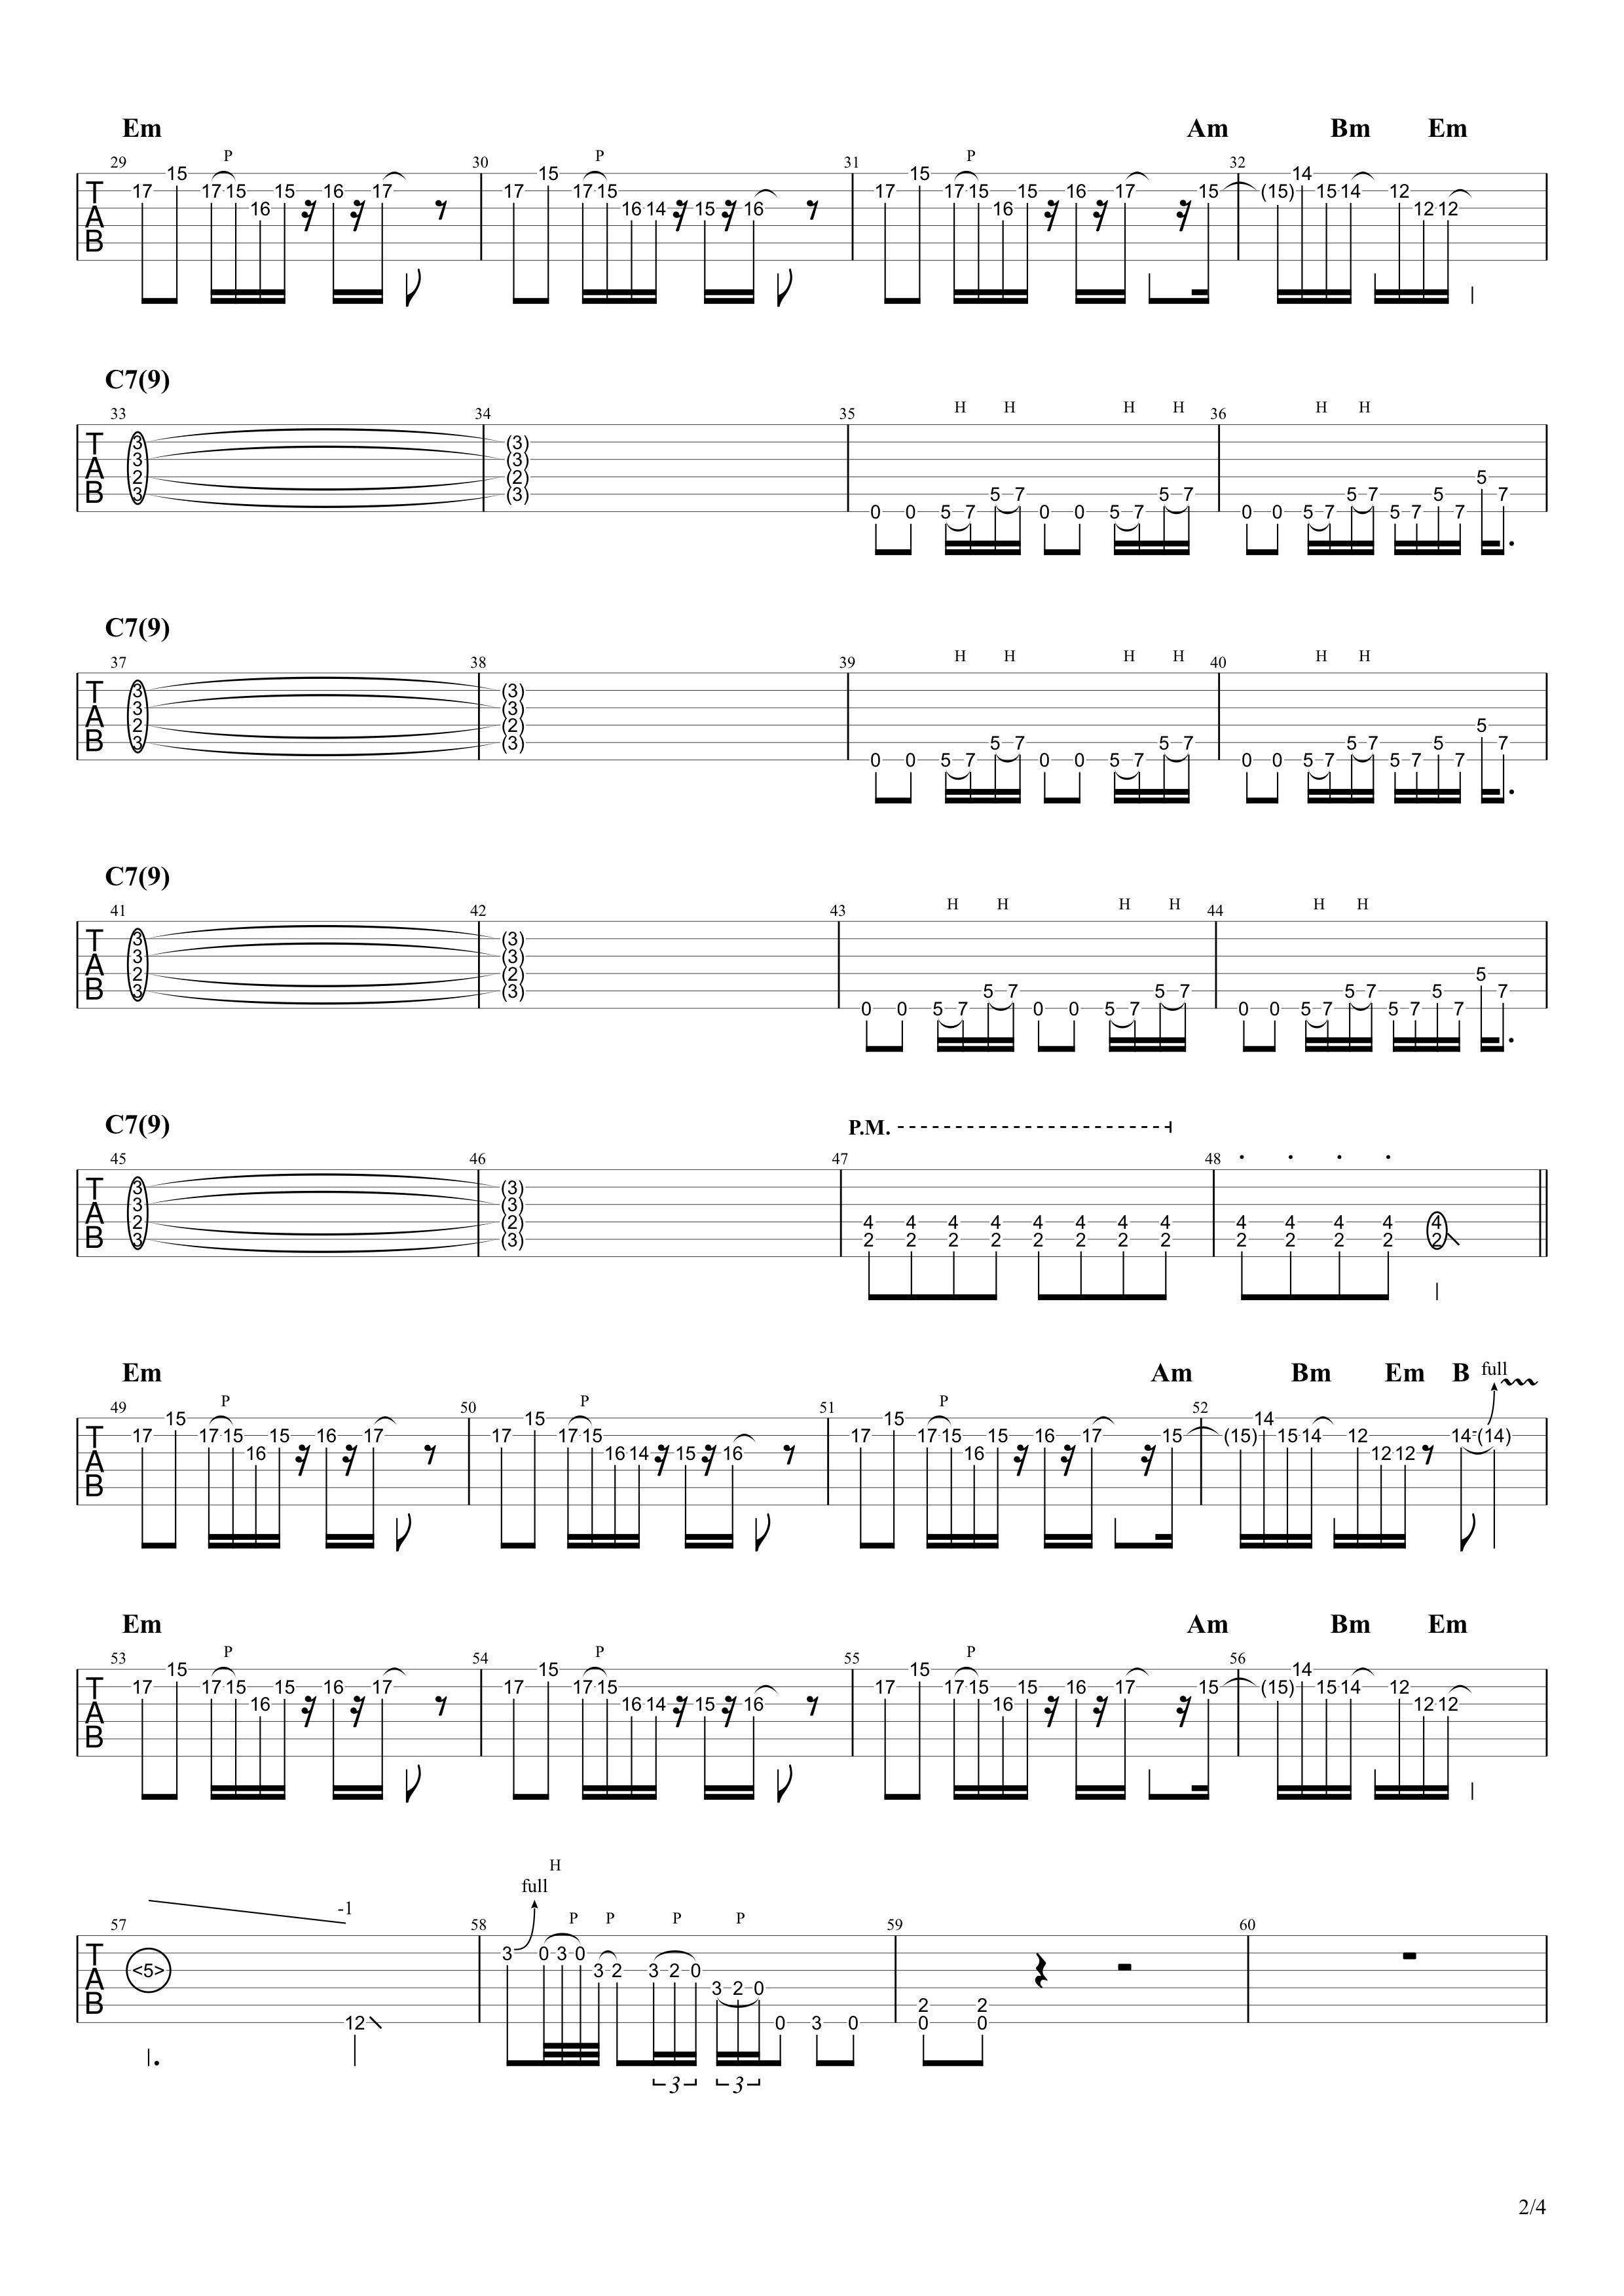 Stereocaster/Charさんパート|ギターTAB譜スコア02